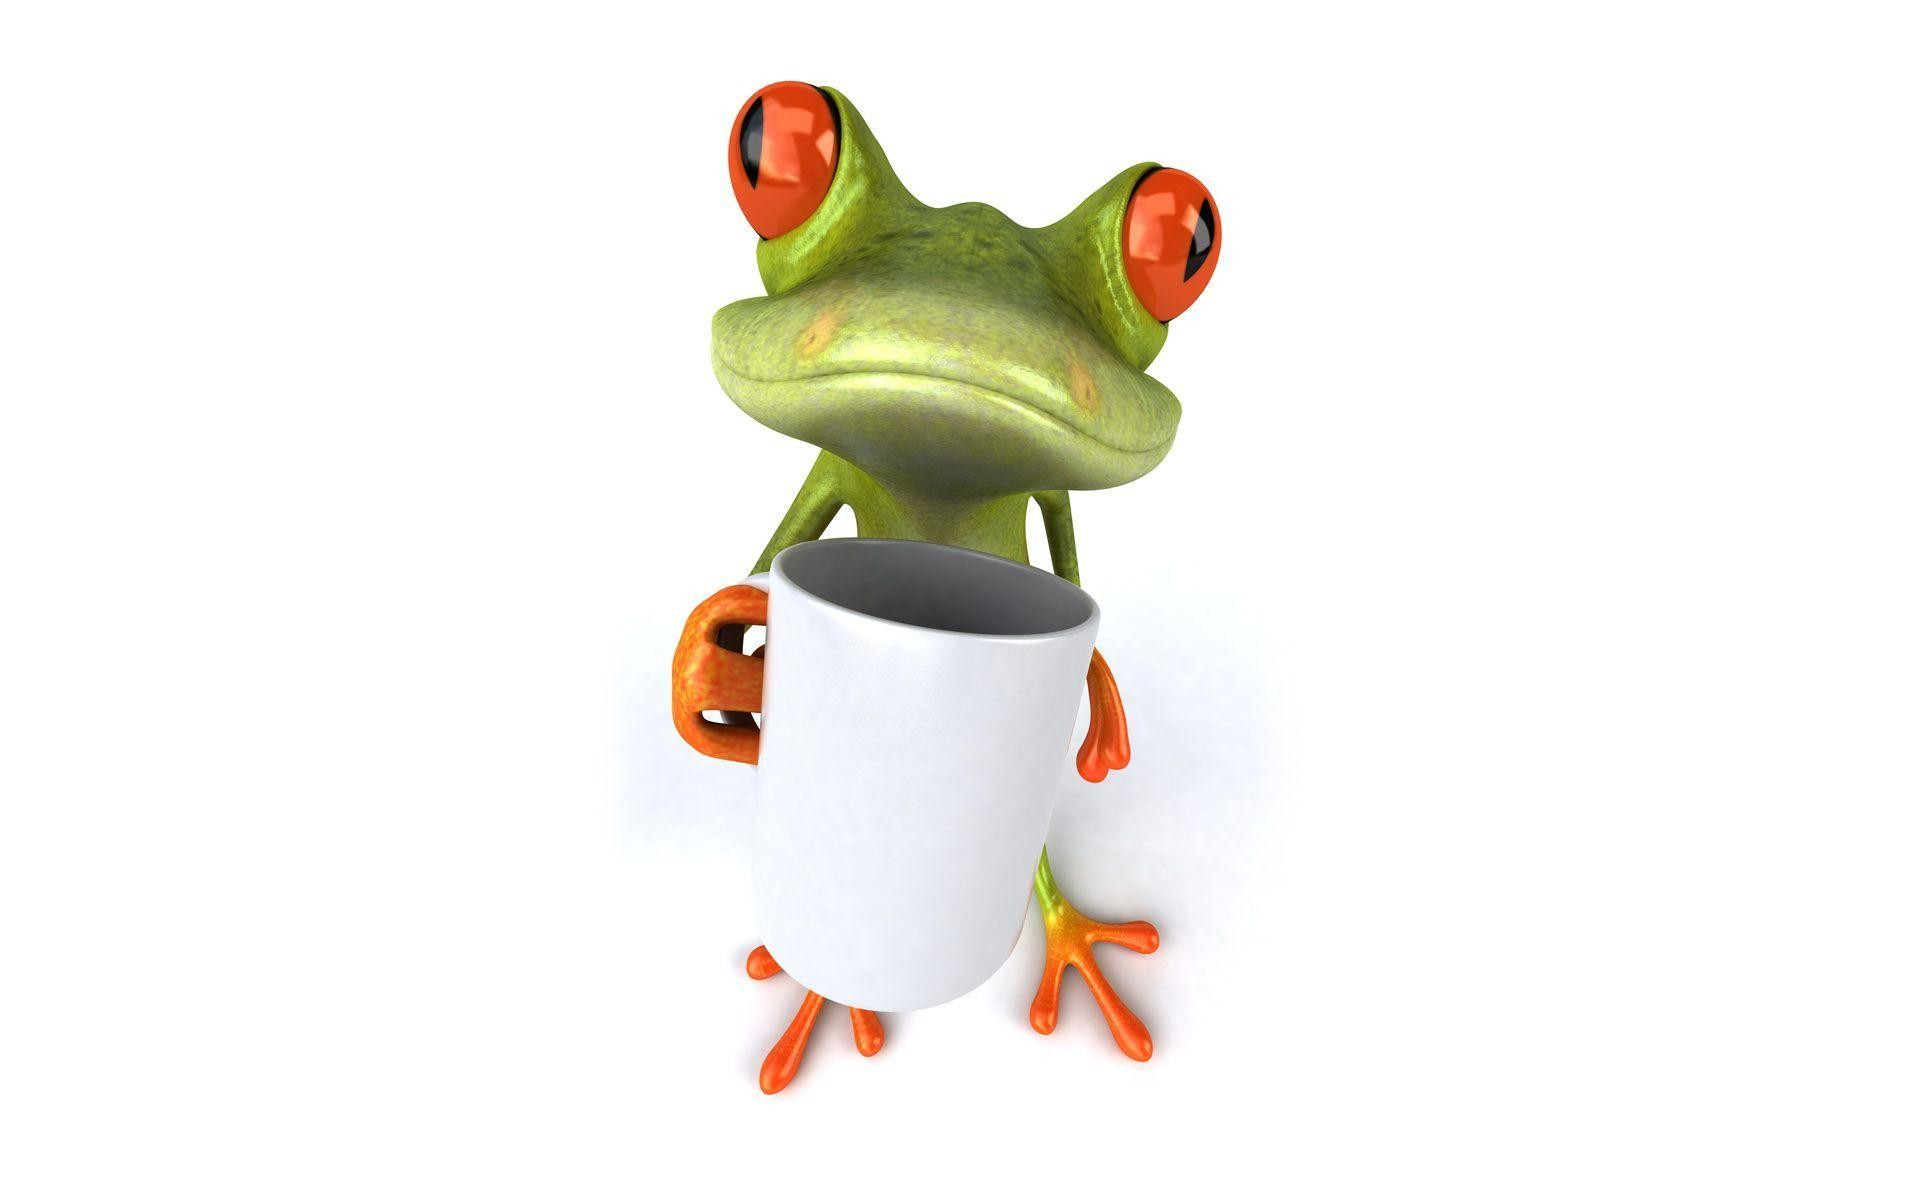 Cute Frog Wallpaper, wallpaper, Cute Frog Wallpaper hd wallpaper .